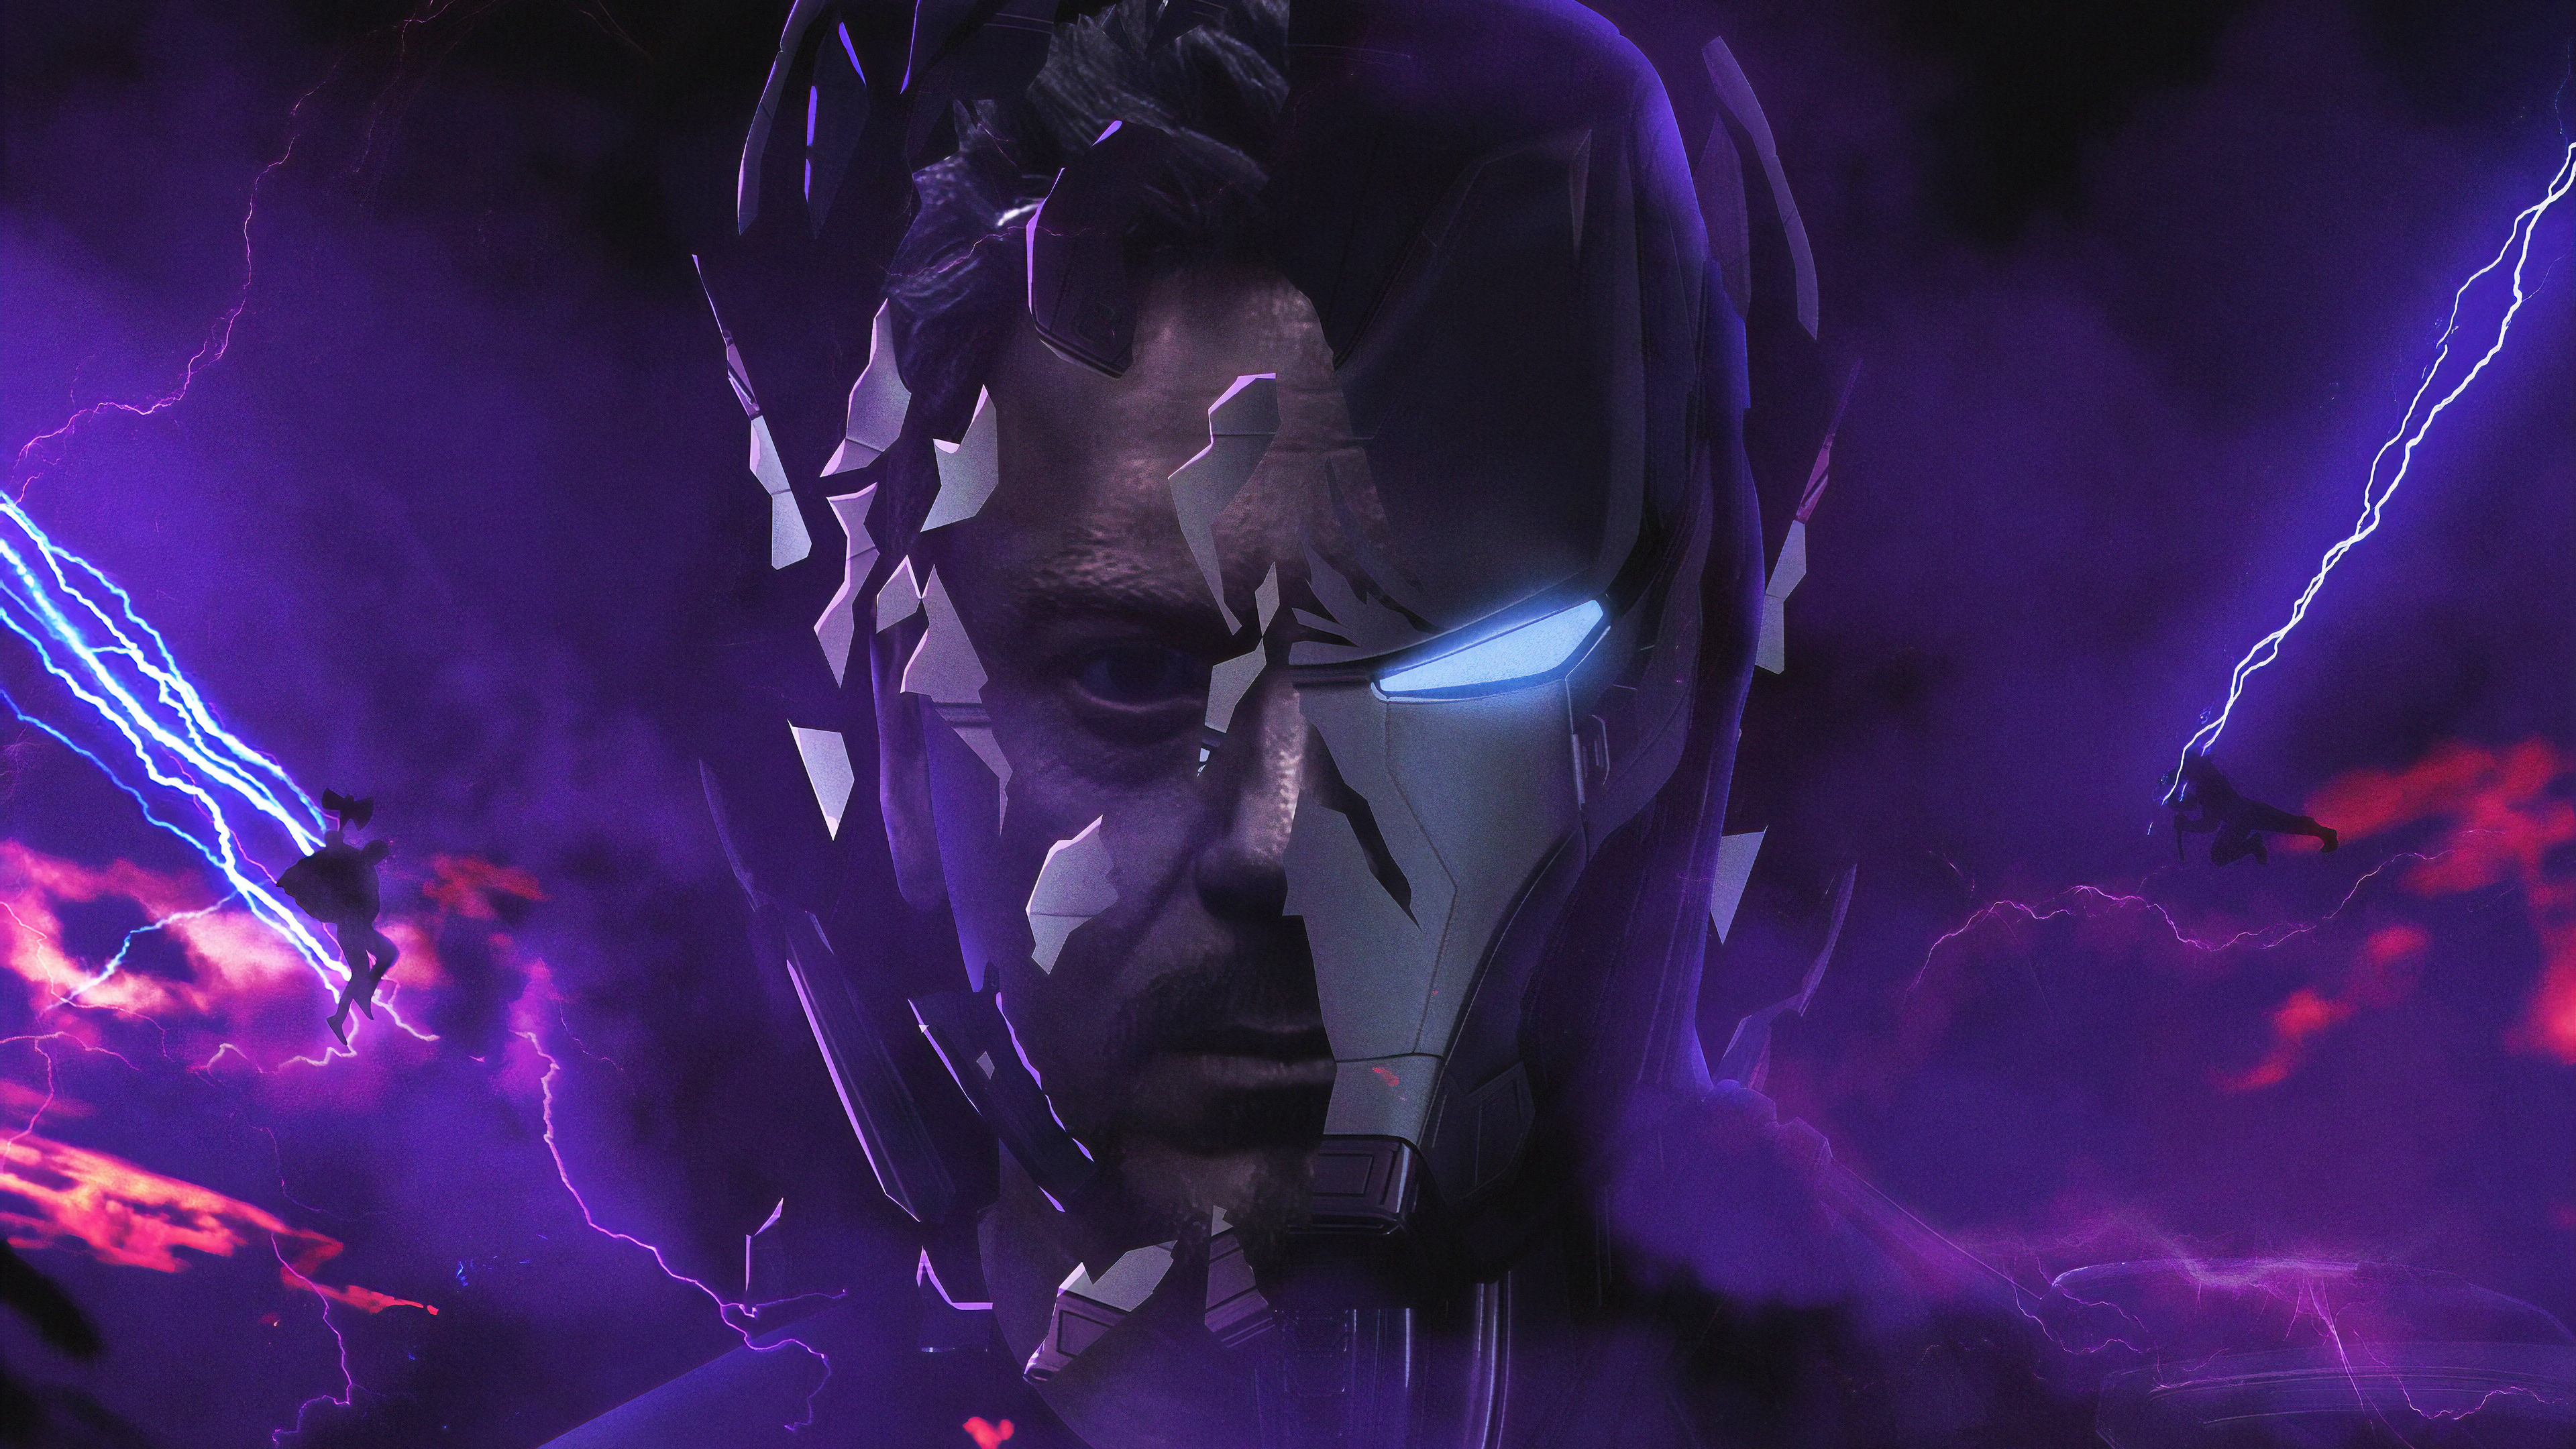 iron man 4k avengers end game 1568054103 - Iron Man 4k Avengers End Game - superheroes wallpapers, iron man wallpapers, hd-wallpapers, digital art wallpapers, artwork wallpapers, artstation wallpapers, 4k-wallpapers